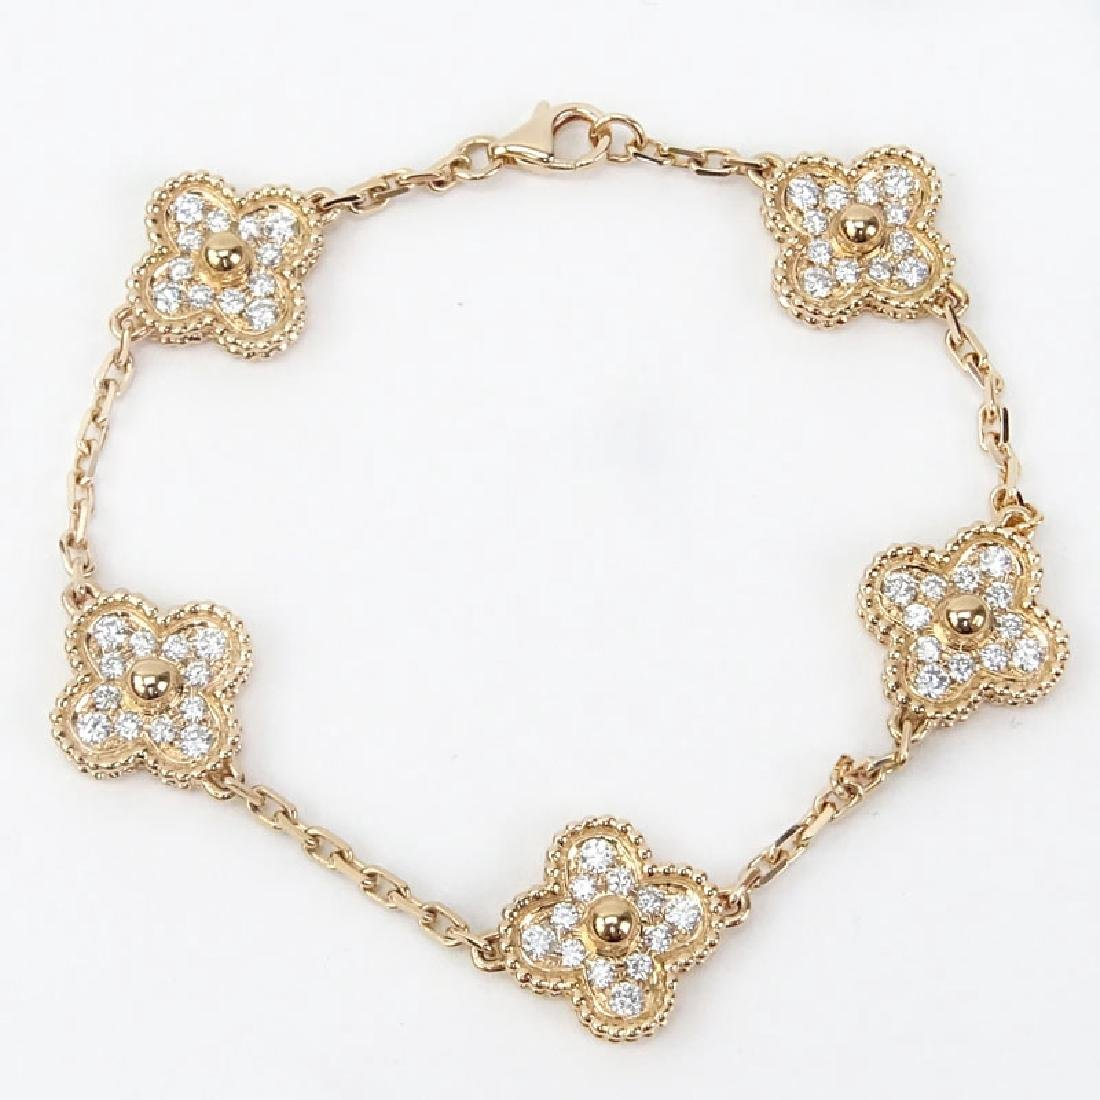 Van Cleef & Arpels style Diamond and 18 Karat Rose Gold